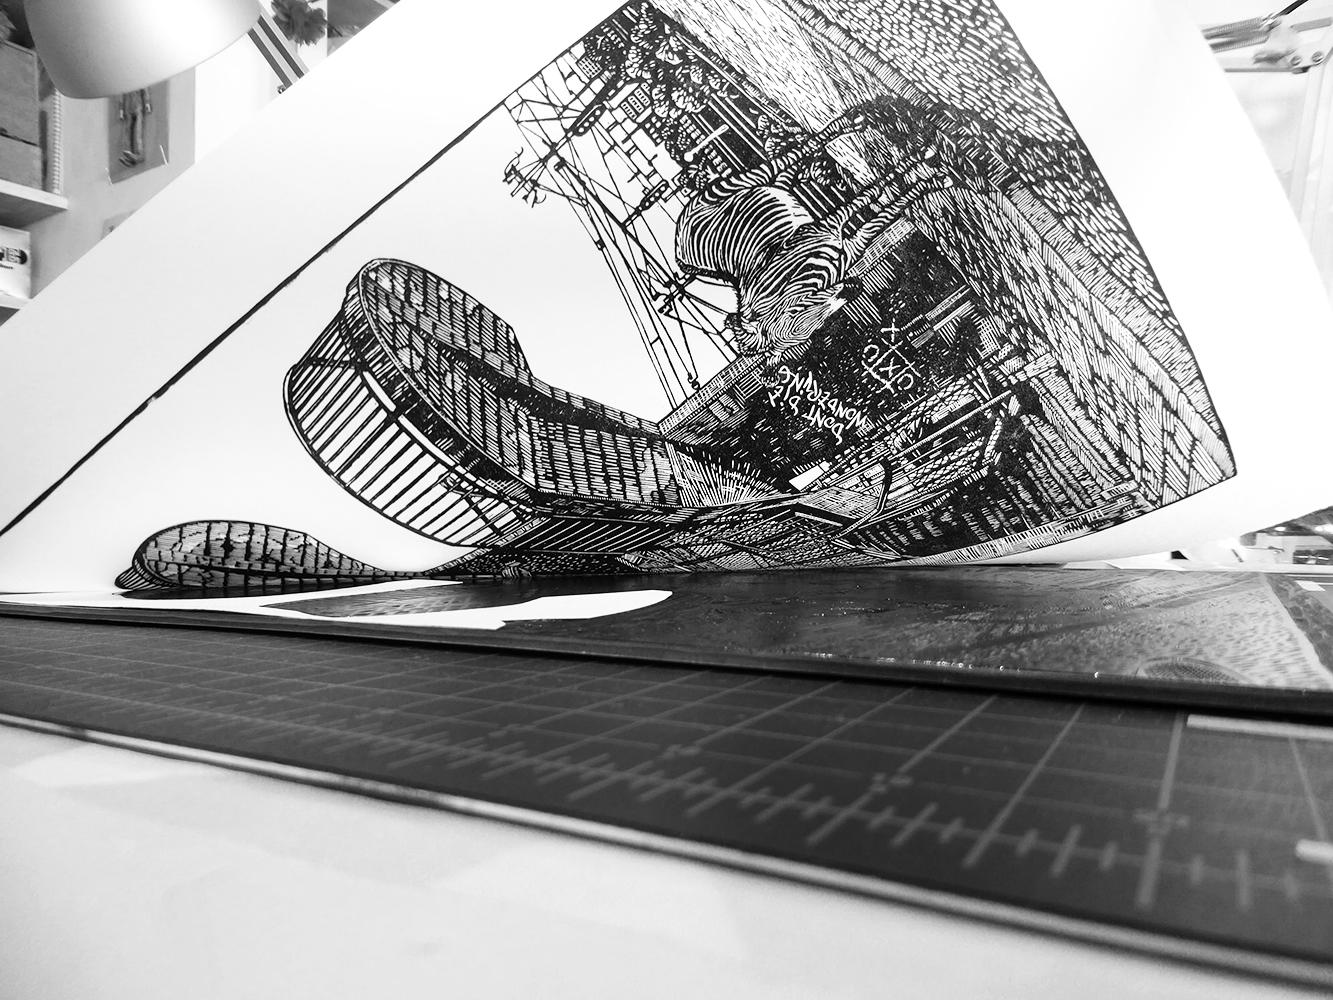 Original linocut, 30 x 45cm. Edition of 20 on Hosho paper. Year 2016.